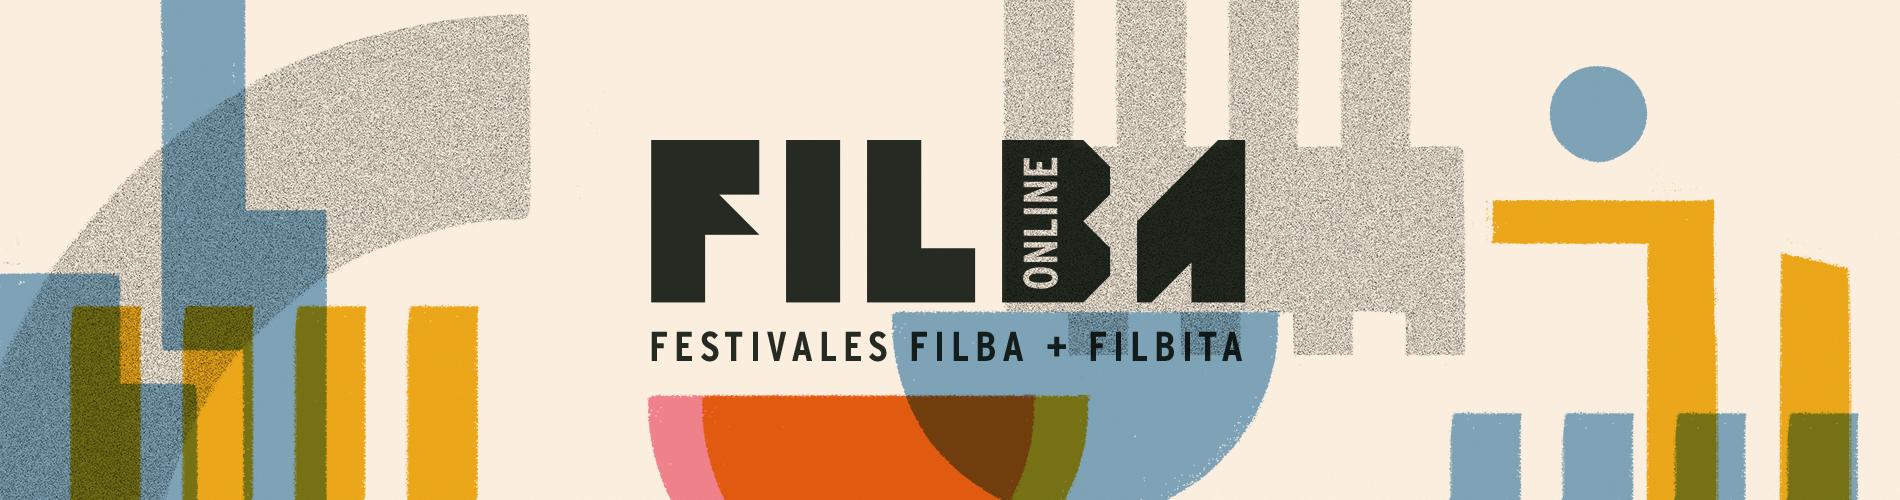 FILBA+FILBITA 10 Online 2020